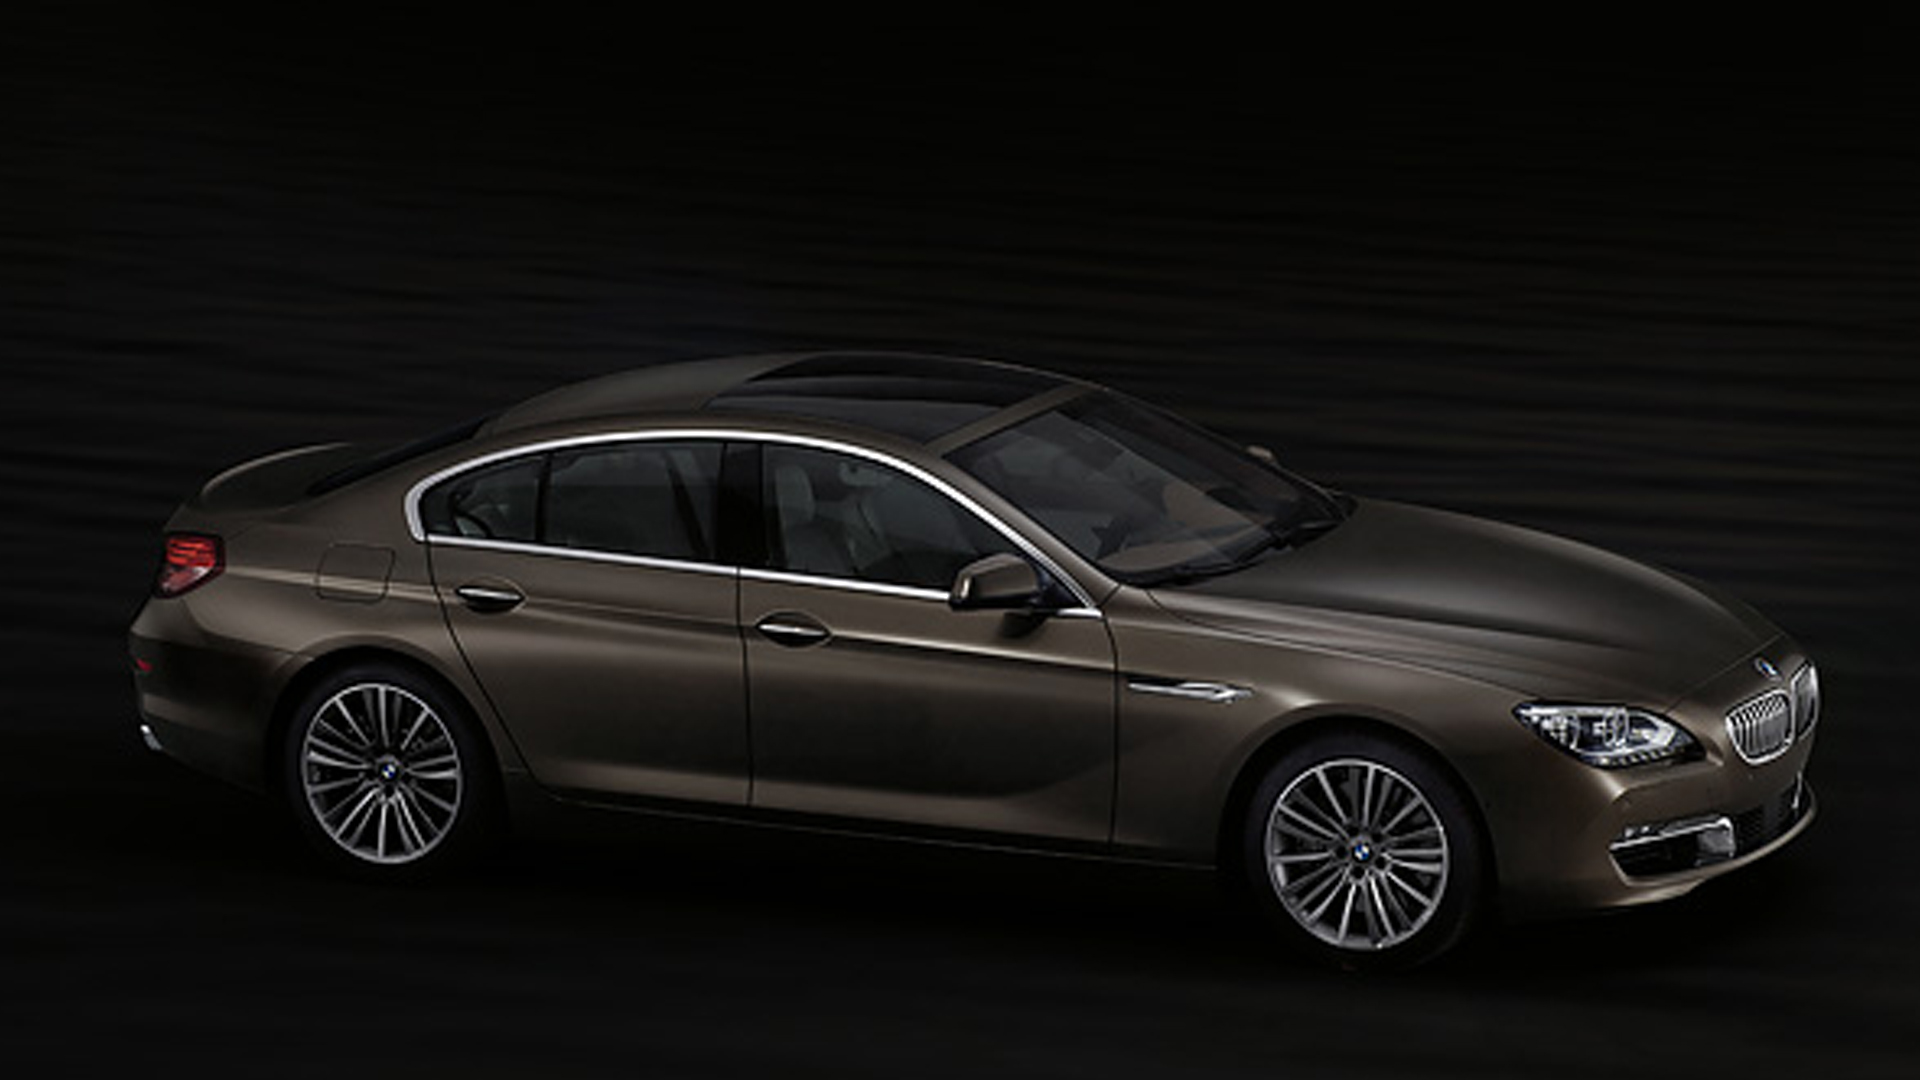 2012 All New BMW 6 Series Grand Coupe   Freak Wheel HD Wallpaper